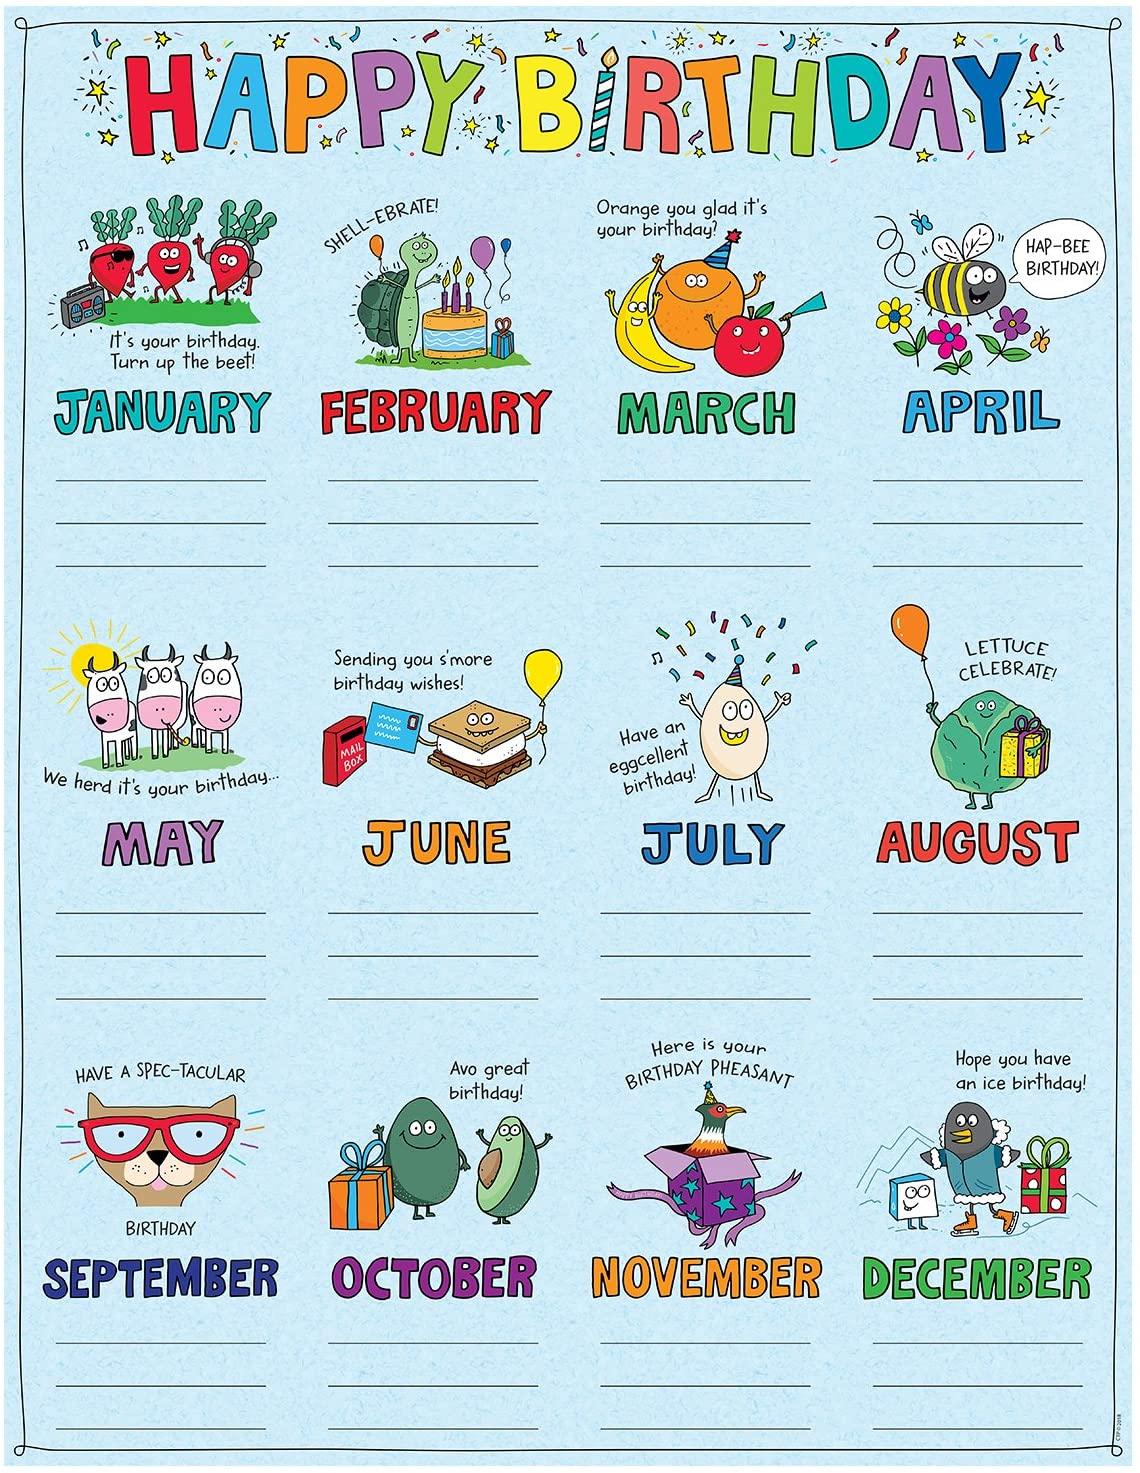 Creative Teaching Press So Much Pun! Happy Birthday Chart (8429)